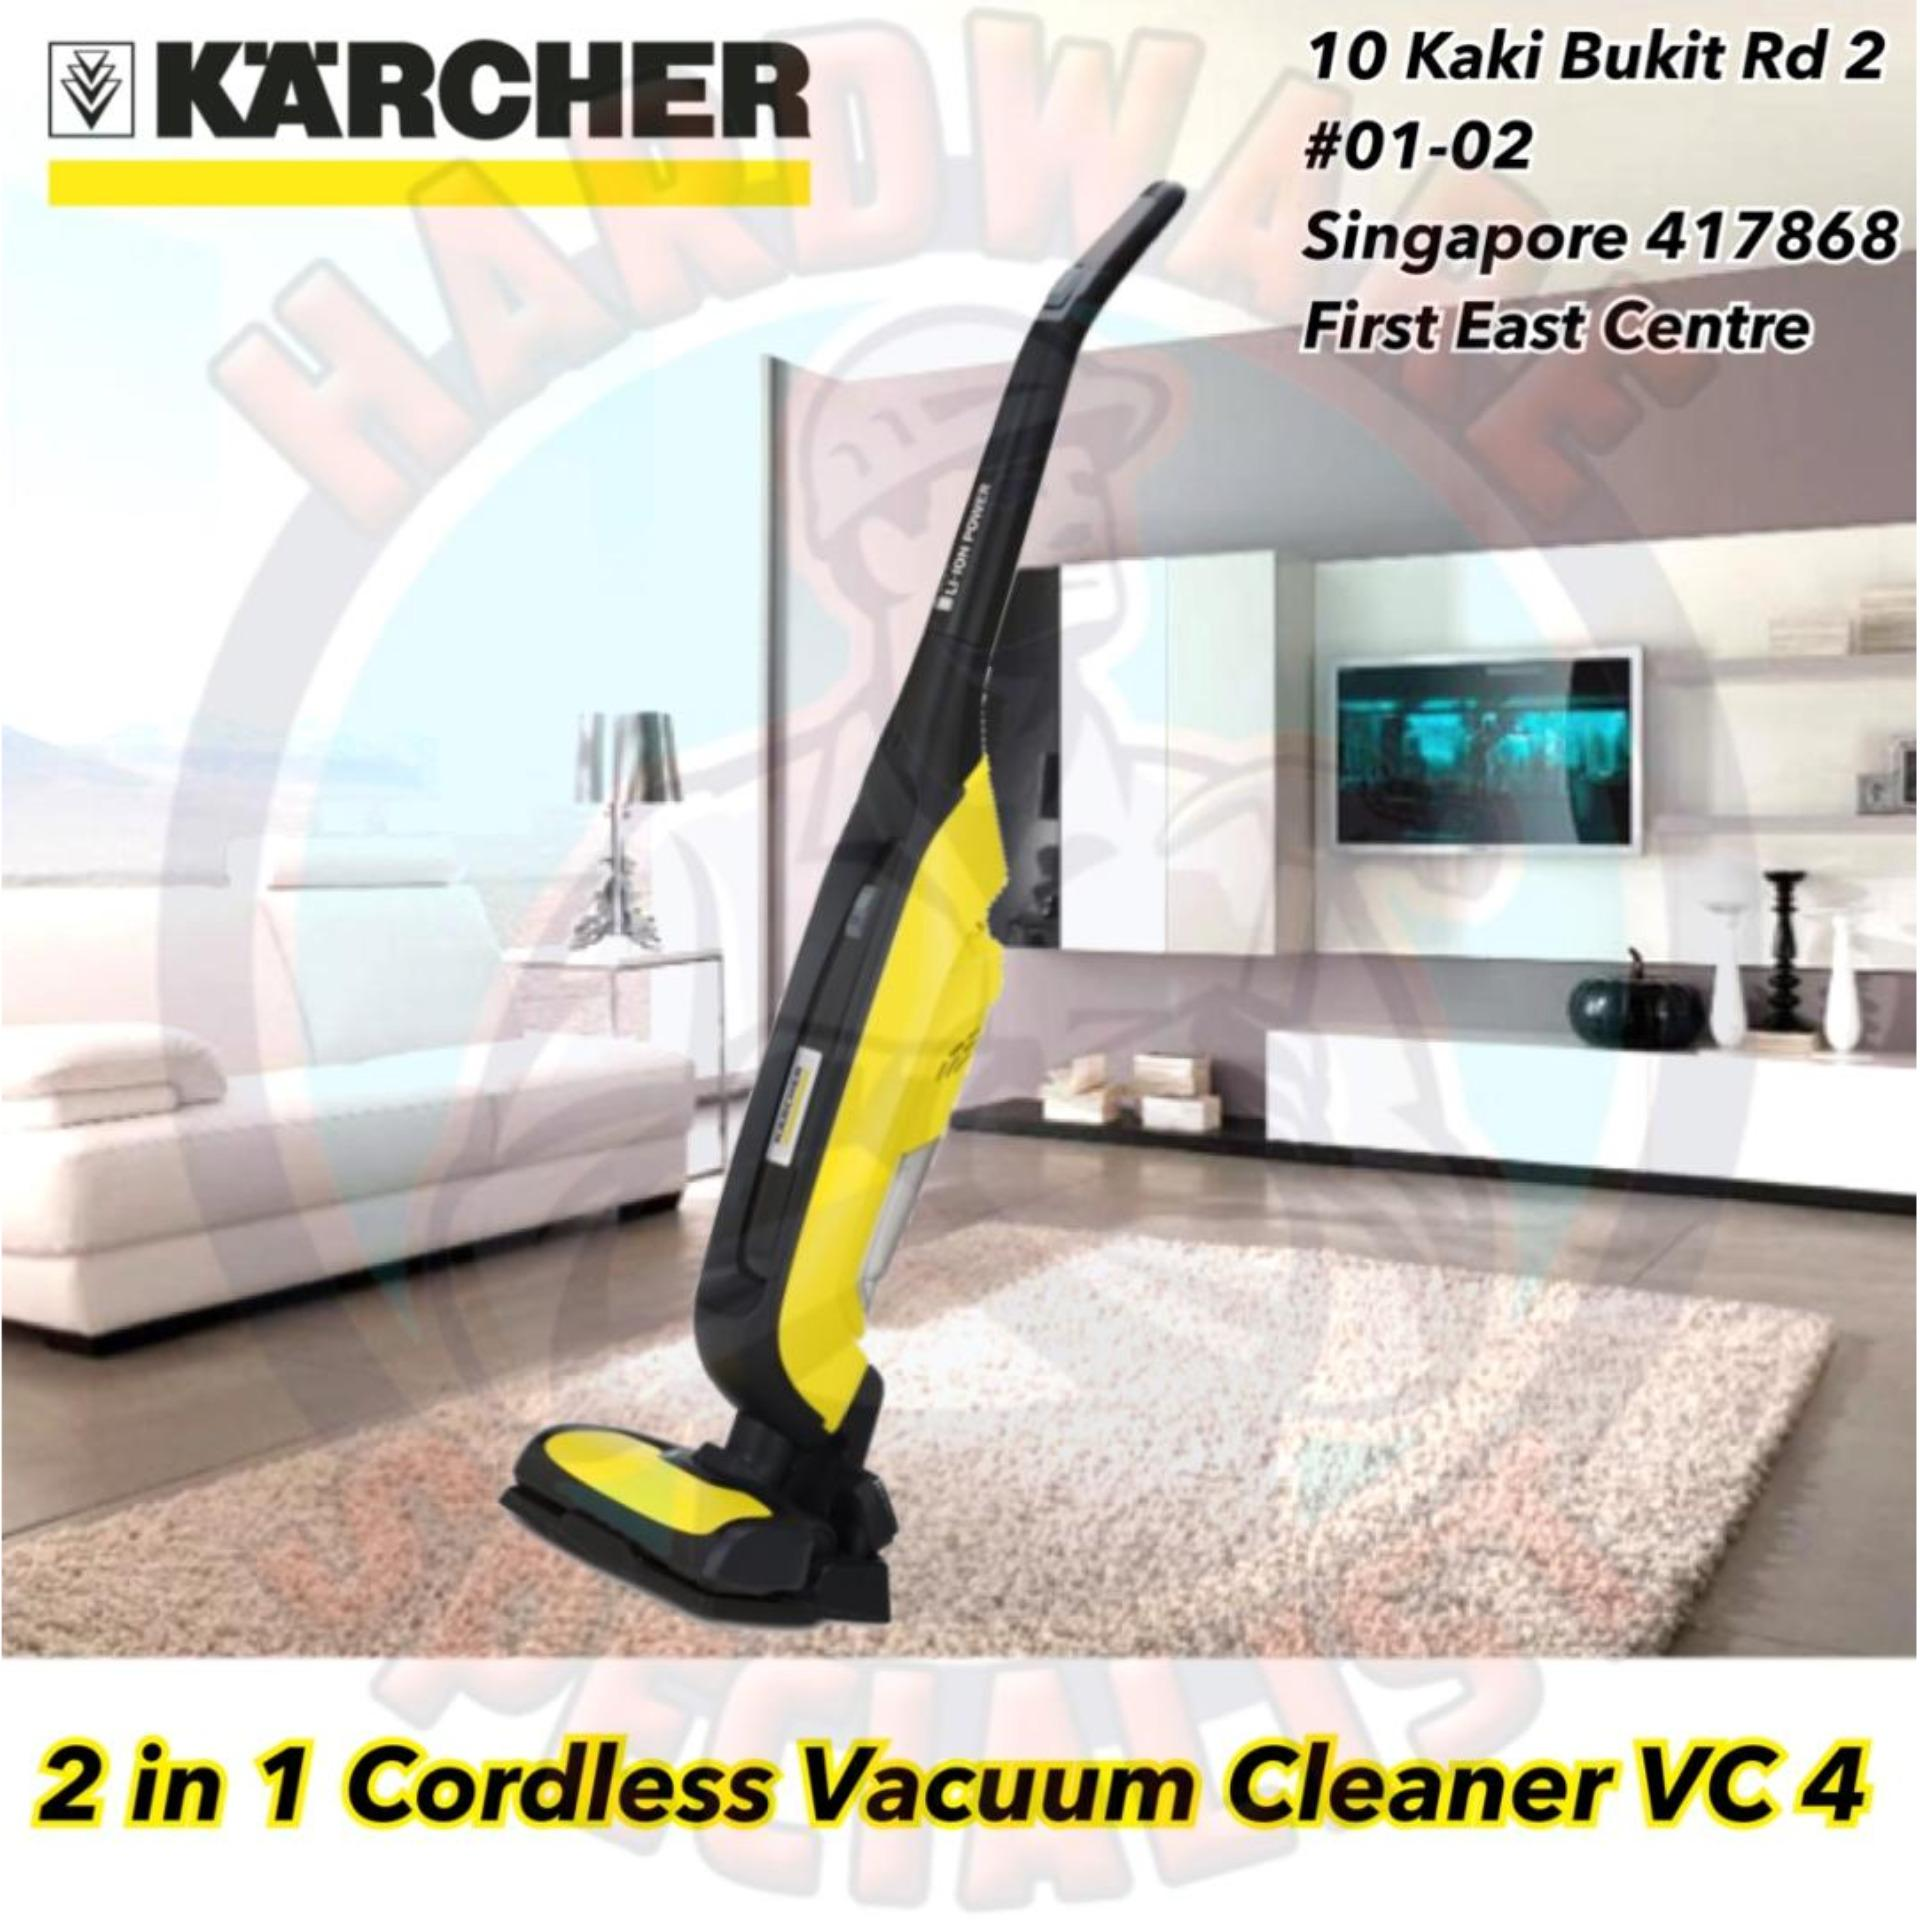 Karcher VC 4 Battery Cordless Vacuum Cleaner Singapore